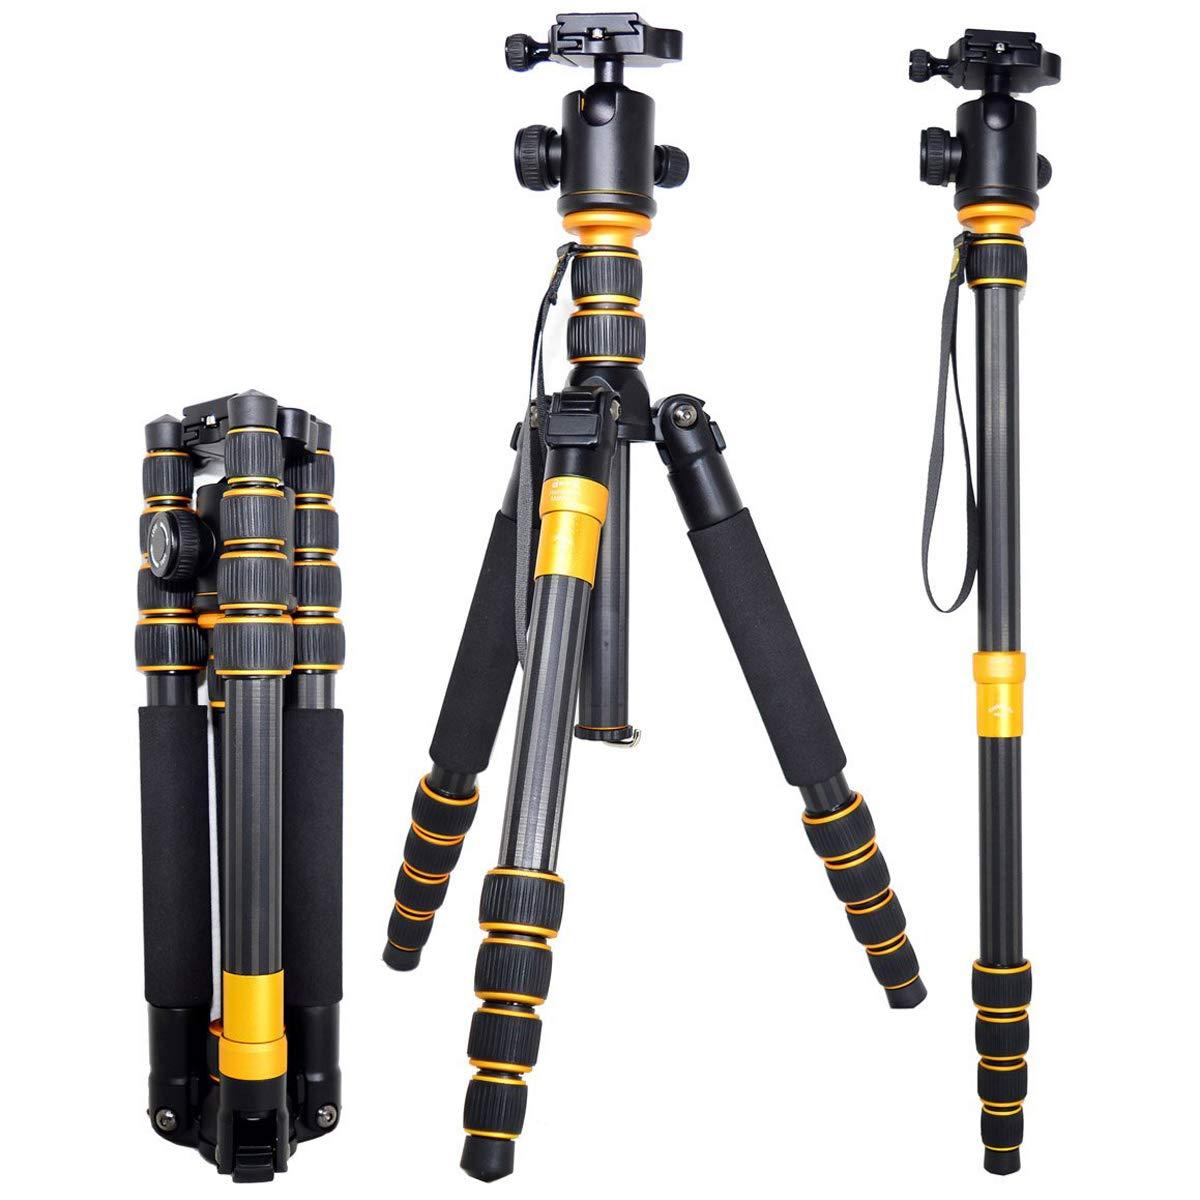 DZSM ポータブルマグネシウム合金三脚キット & ボールヘッドコンパクトトラベル一脚 すべてのカメラとビデオカメラ用 159CM   B07MW94GXF